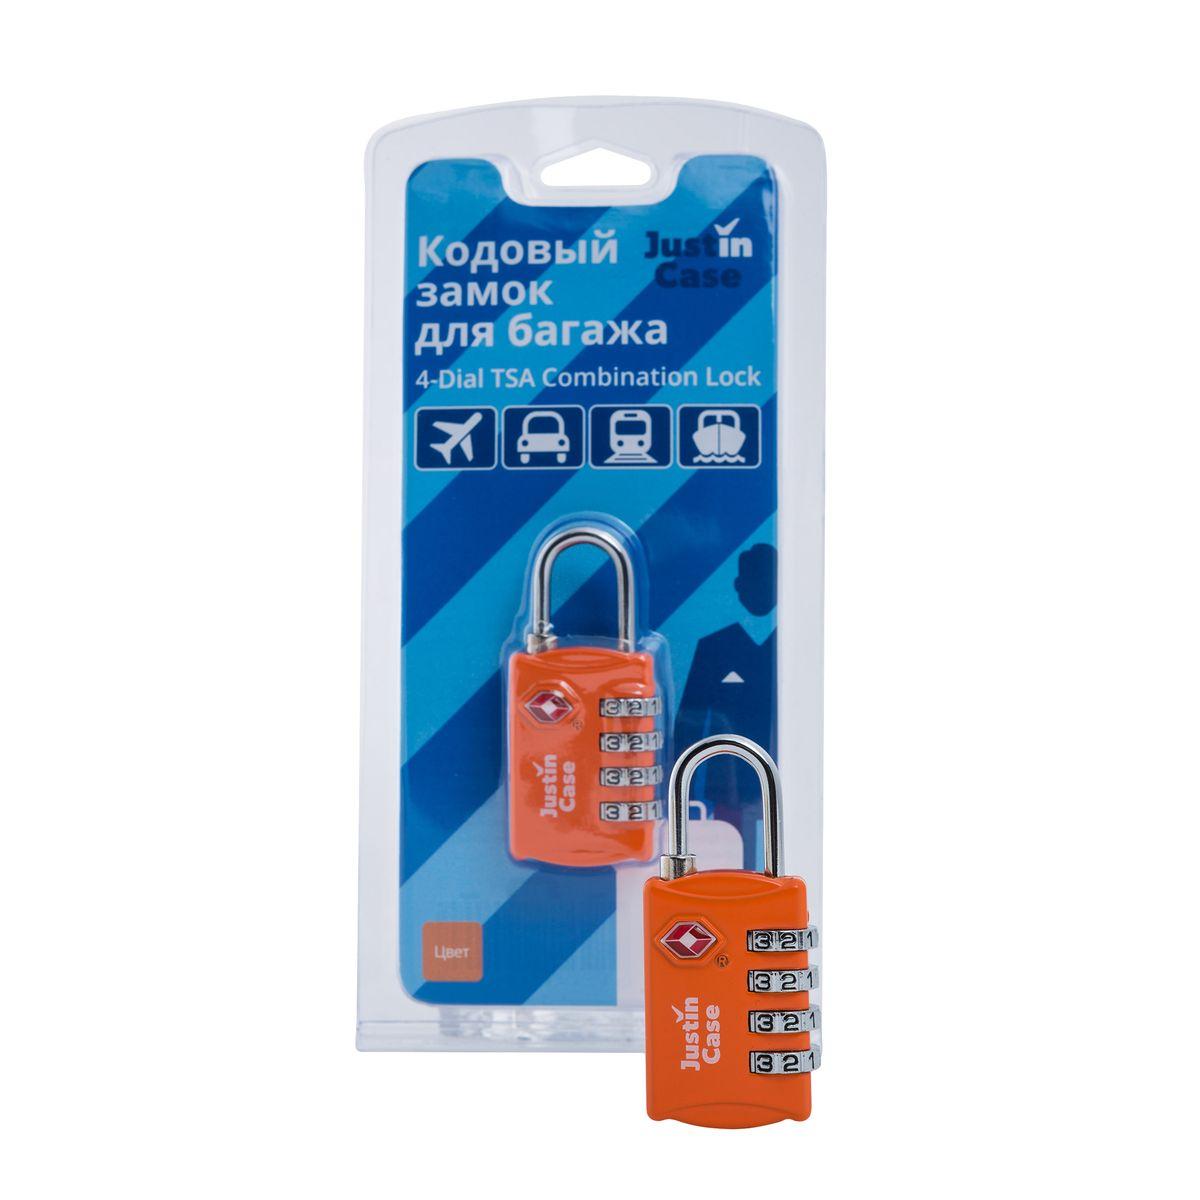 Замок кодовый для багажа JustinCase  4-Dial TSA Combination Lock , цвет: оранжевый - Замки для багажа